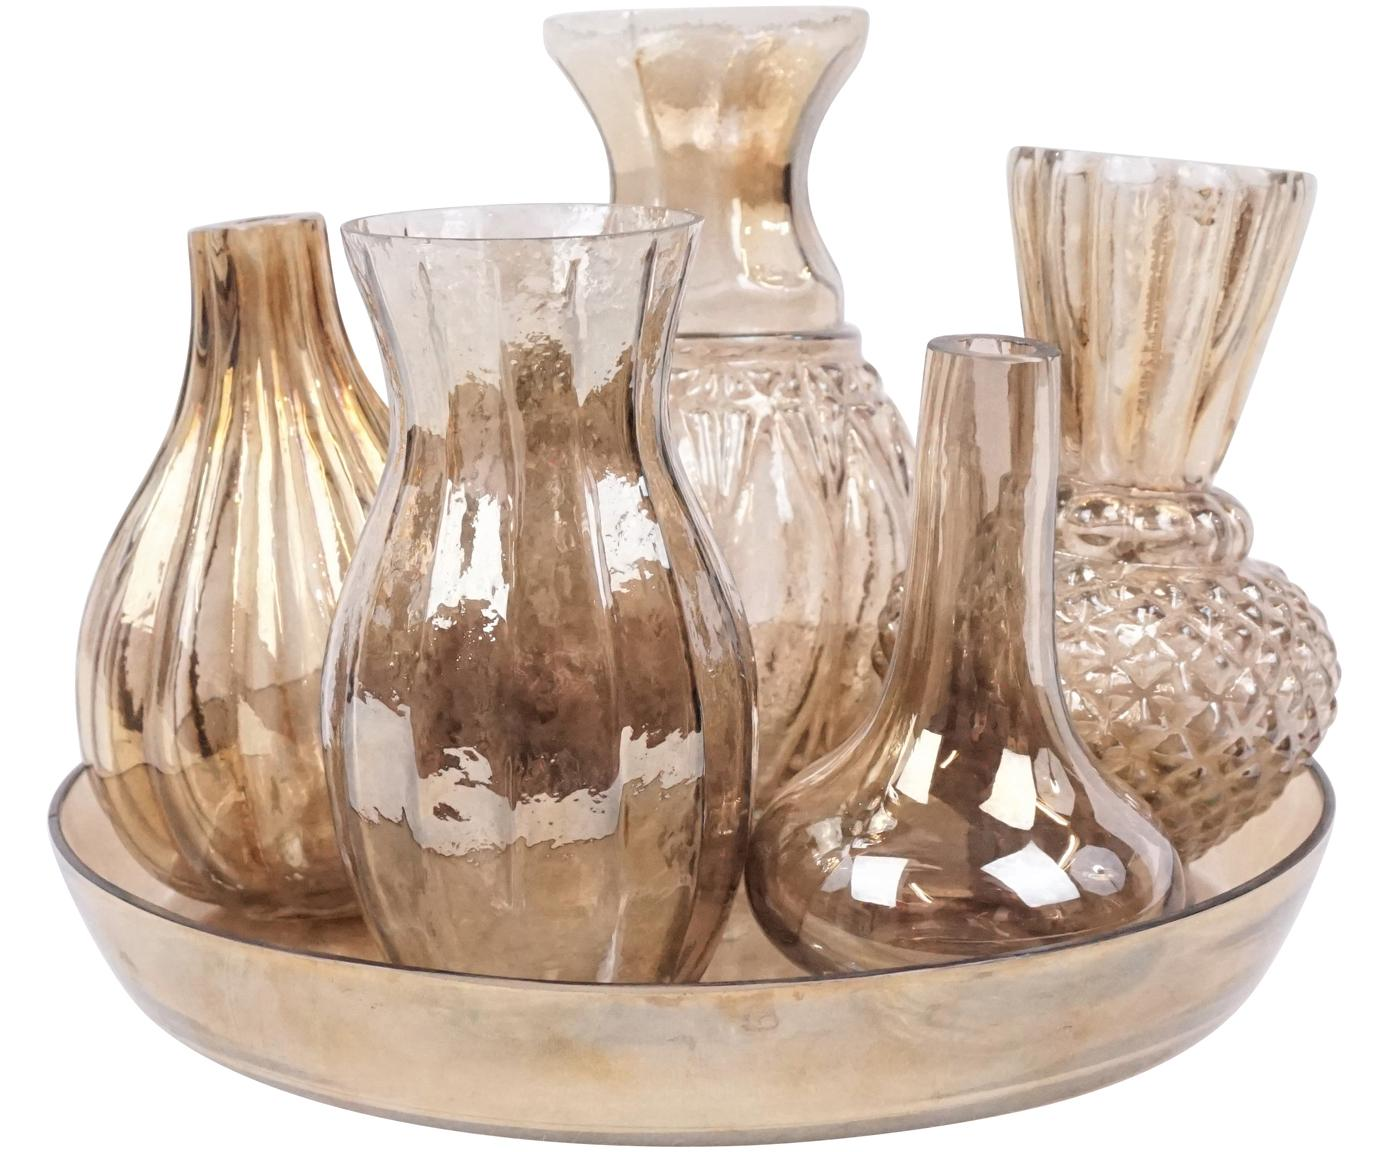 Set 6 vasi in vetro Poesie, Vetro, Dorato, Diverse dimensioni